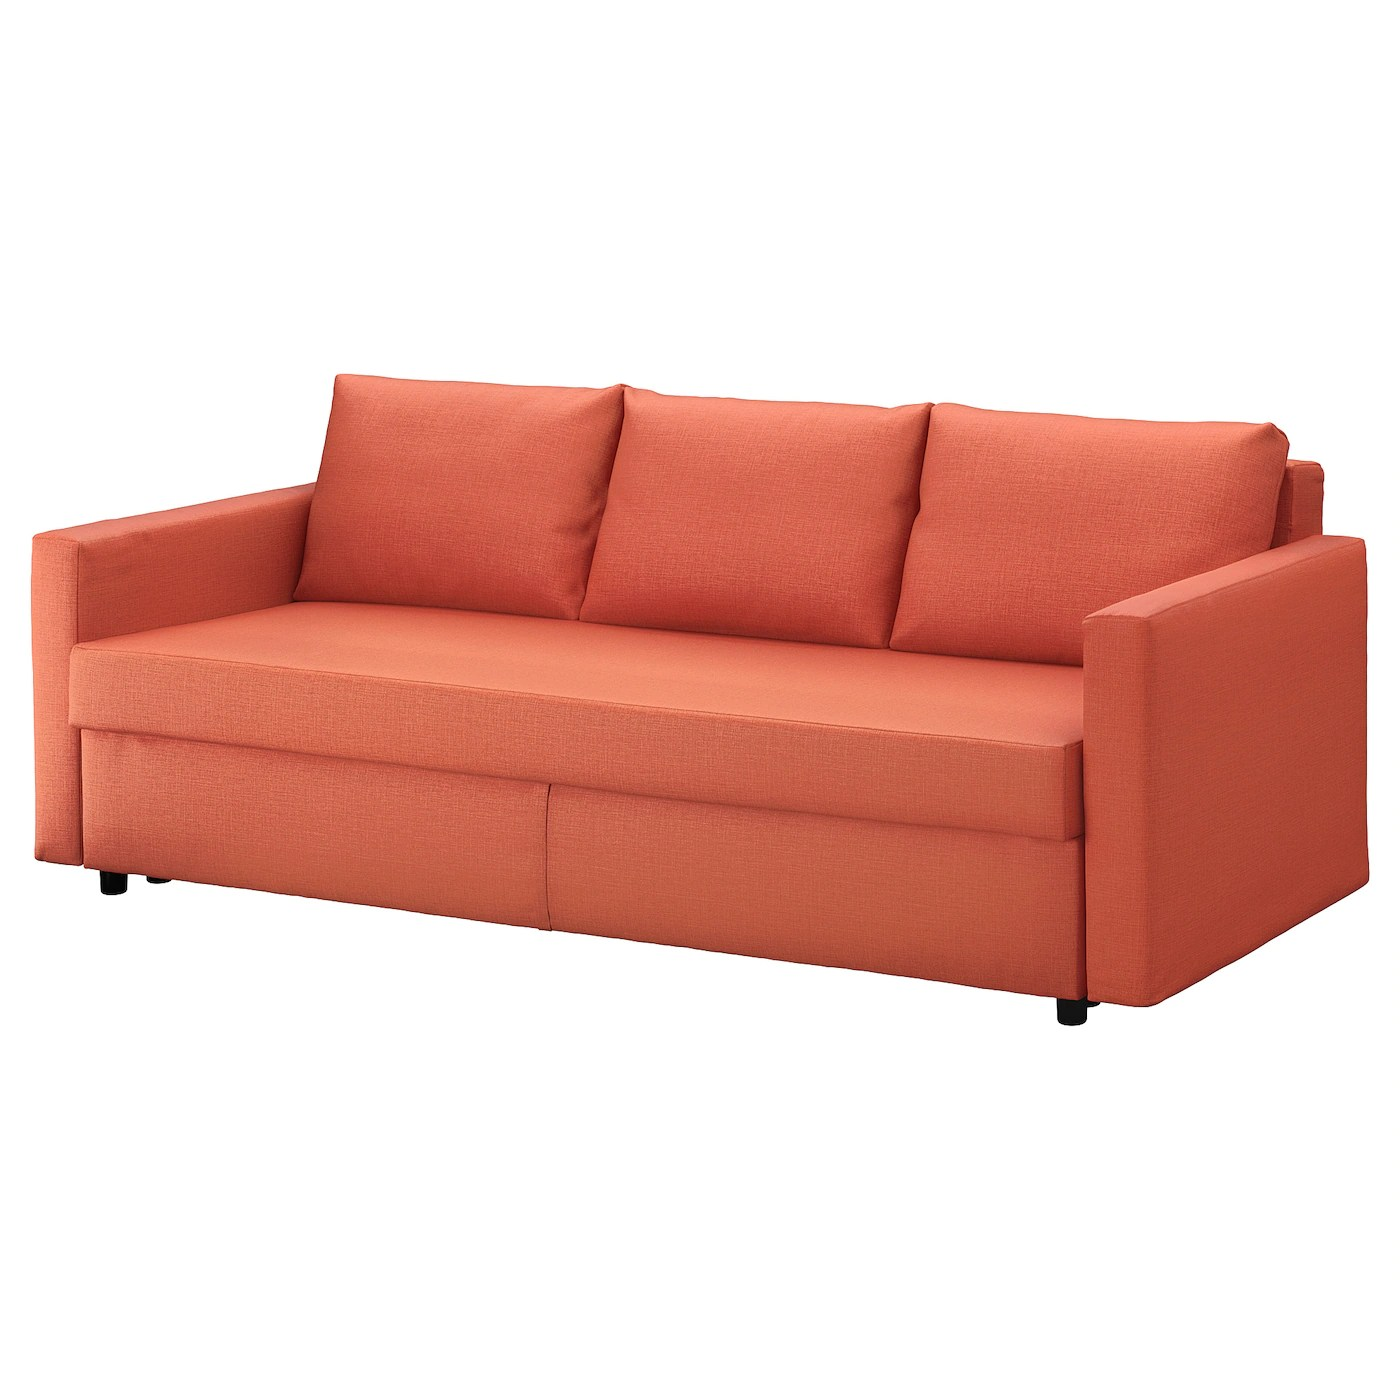 ikea lycksele sofa bed orange seafoam green sleeper divan deluxe signature by